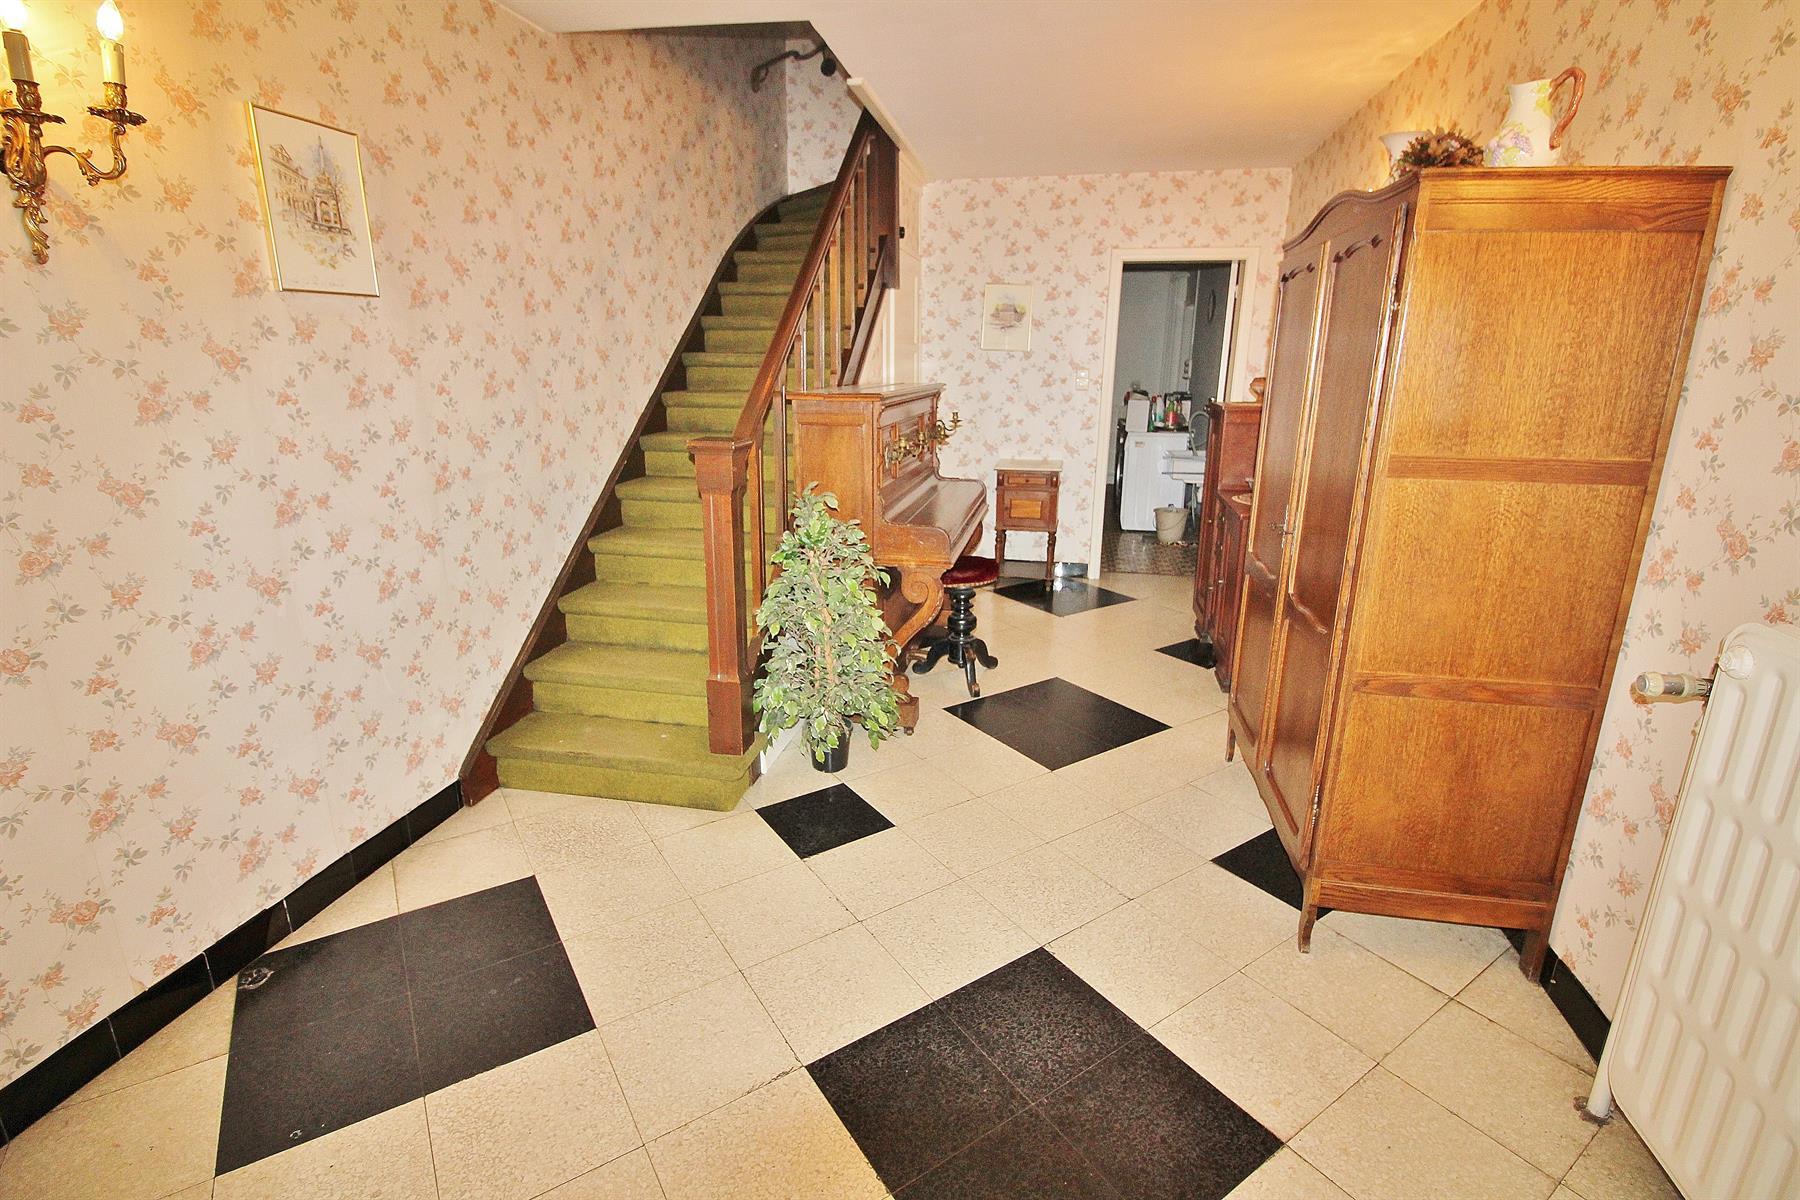 Bel-étage - Liege - #3470588-1